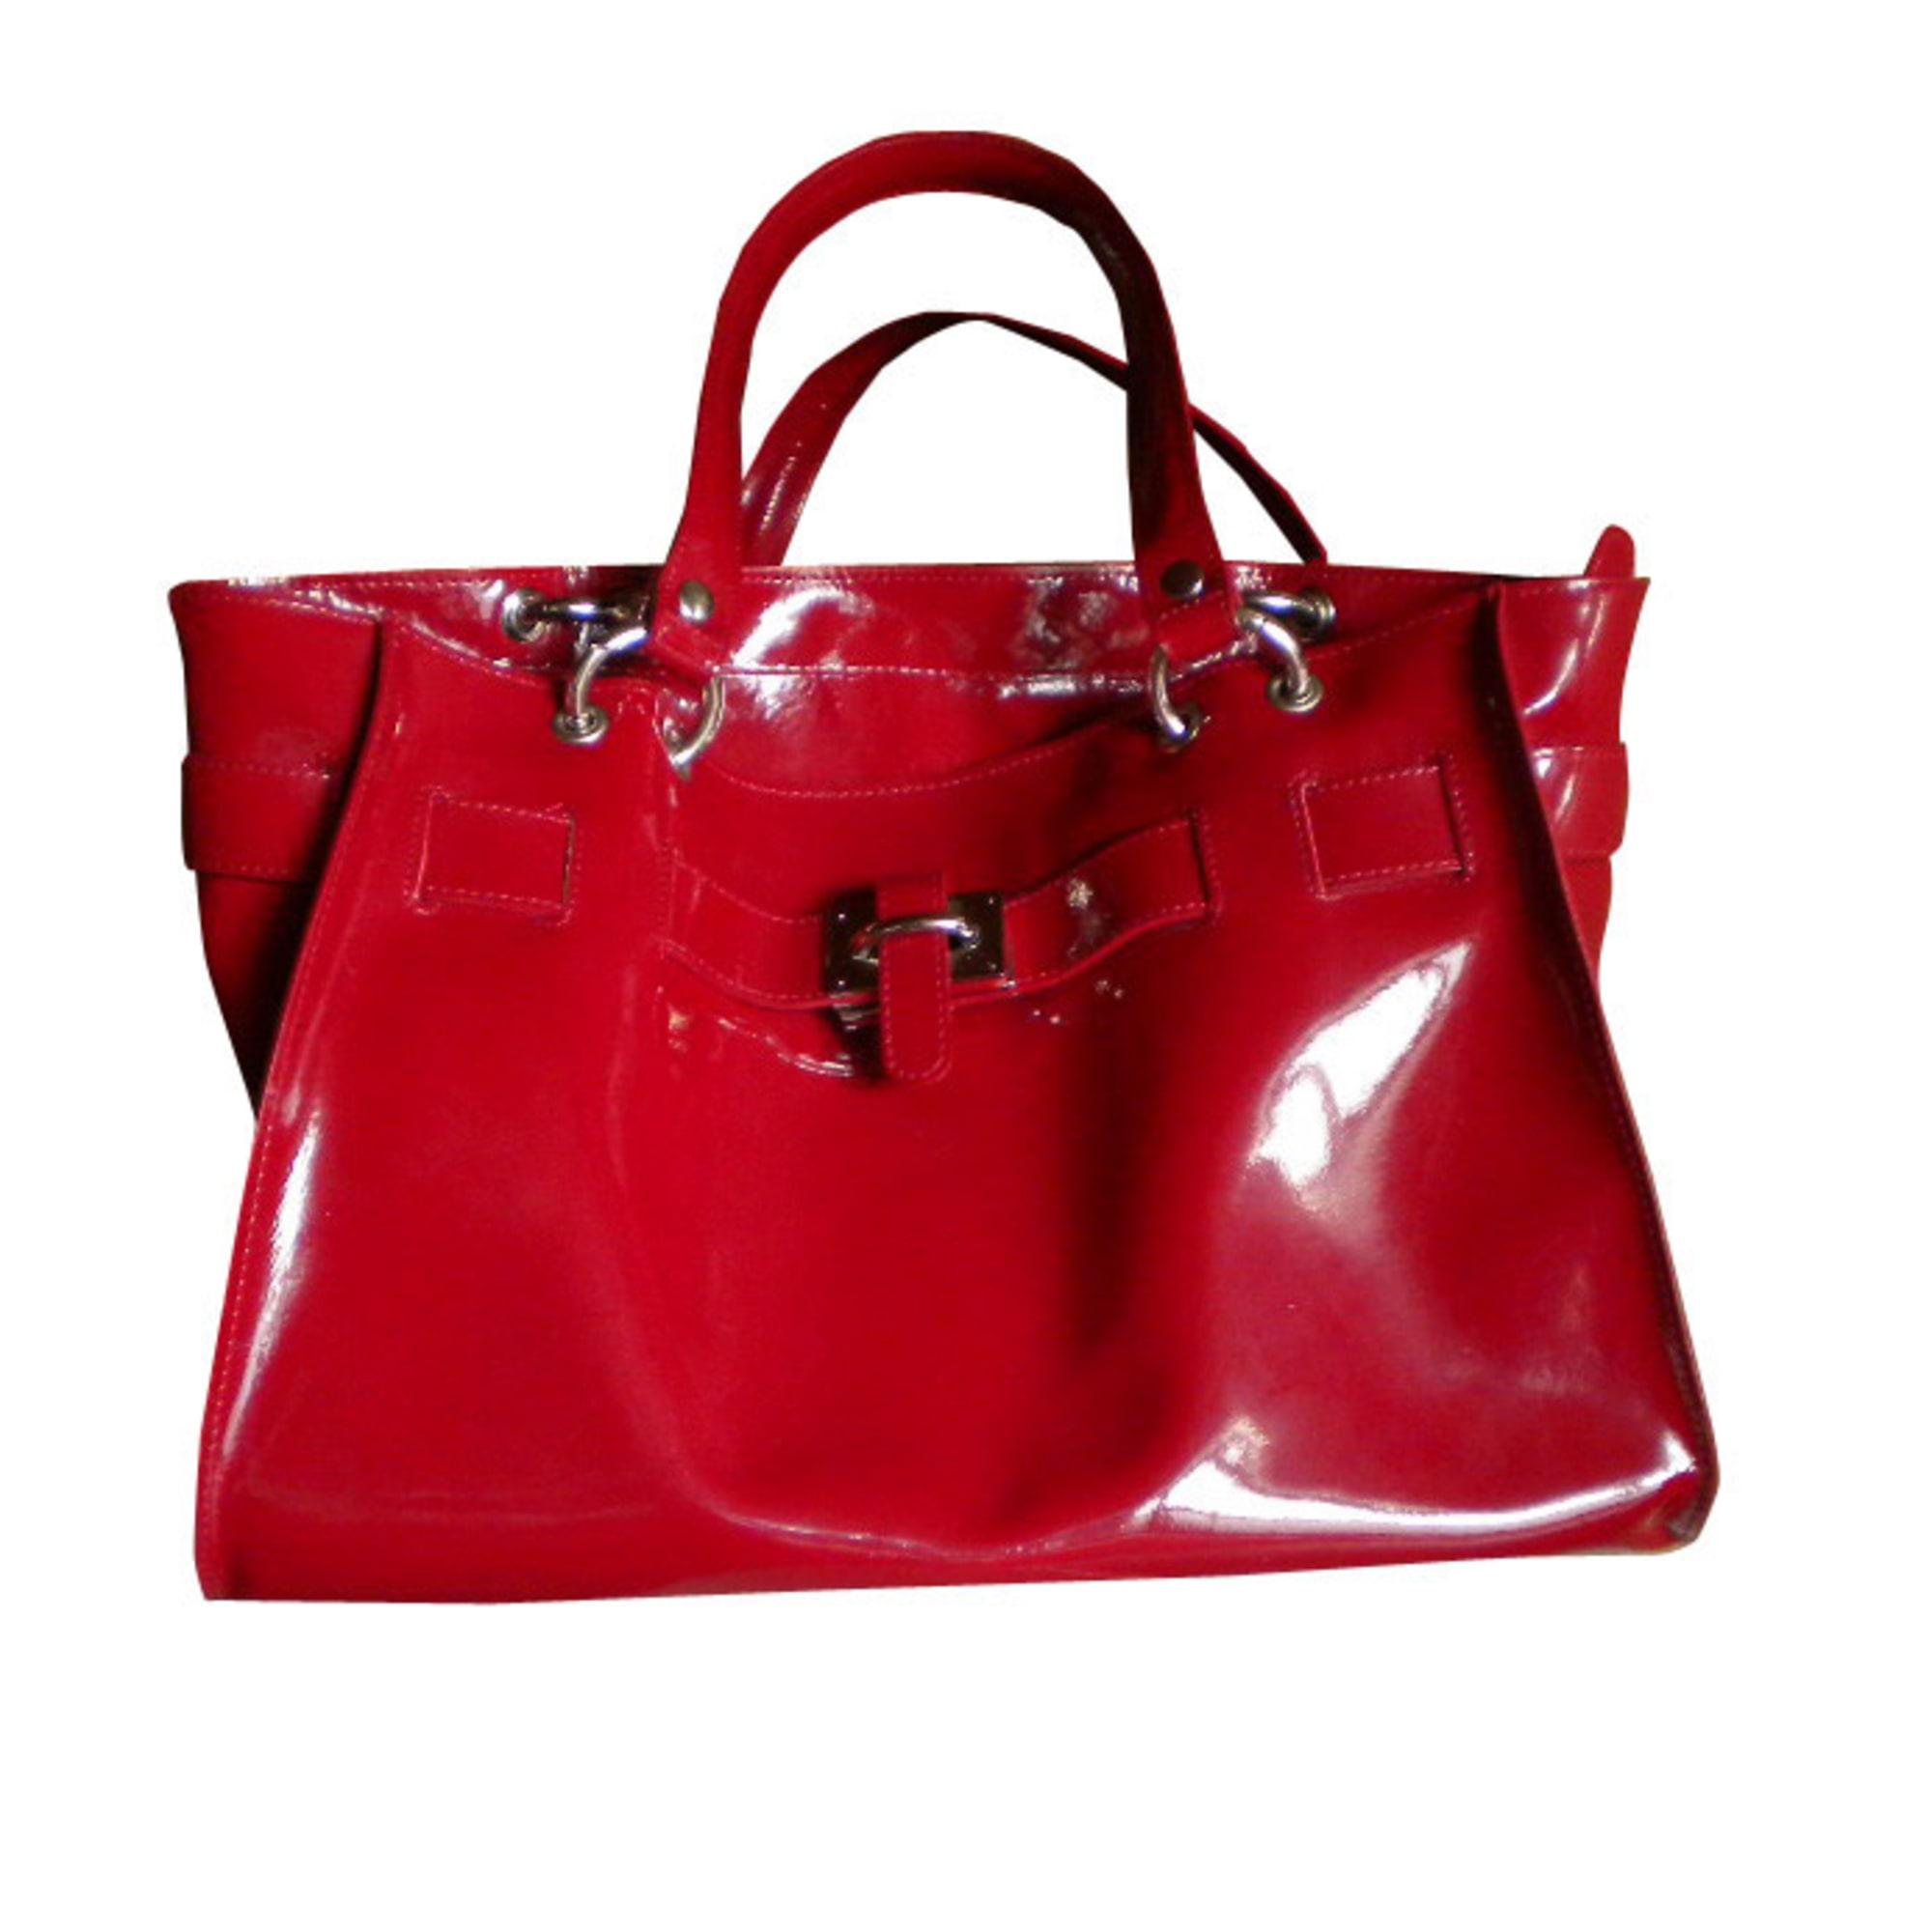 b9638caa2312 Sac à main en cuir TEXIER rouge vendu par Myriam 2